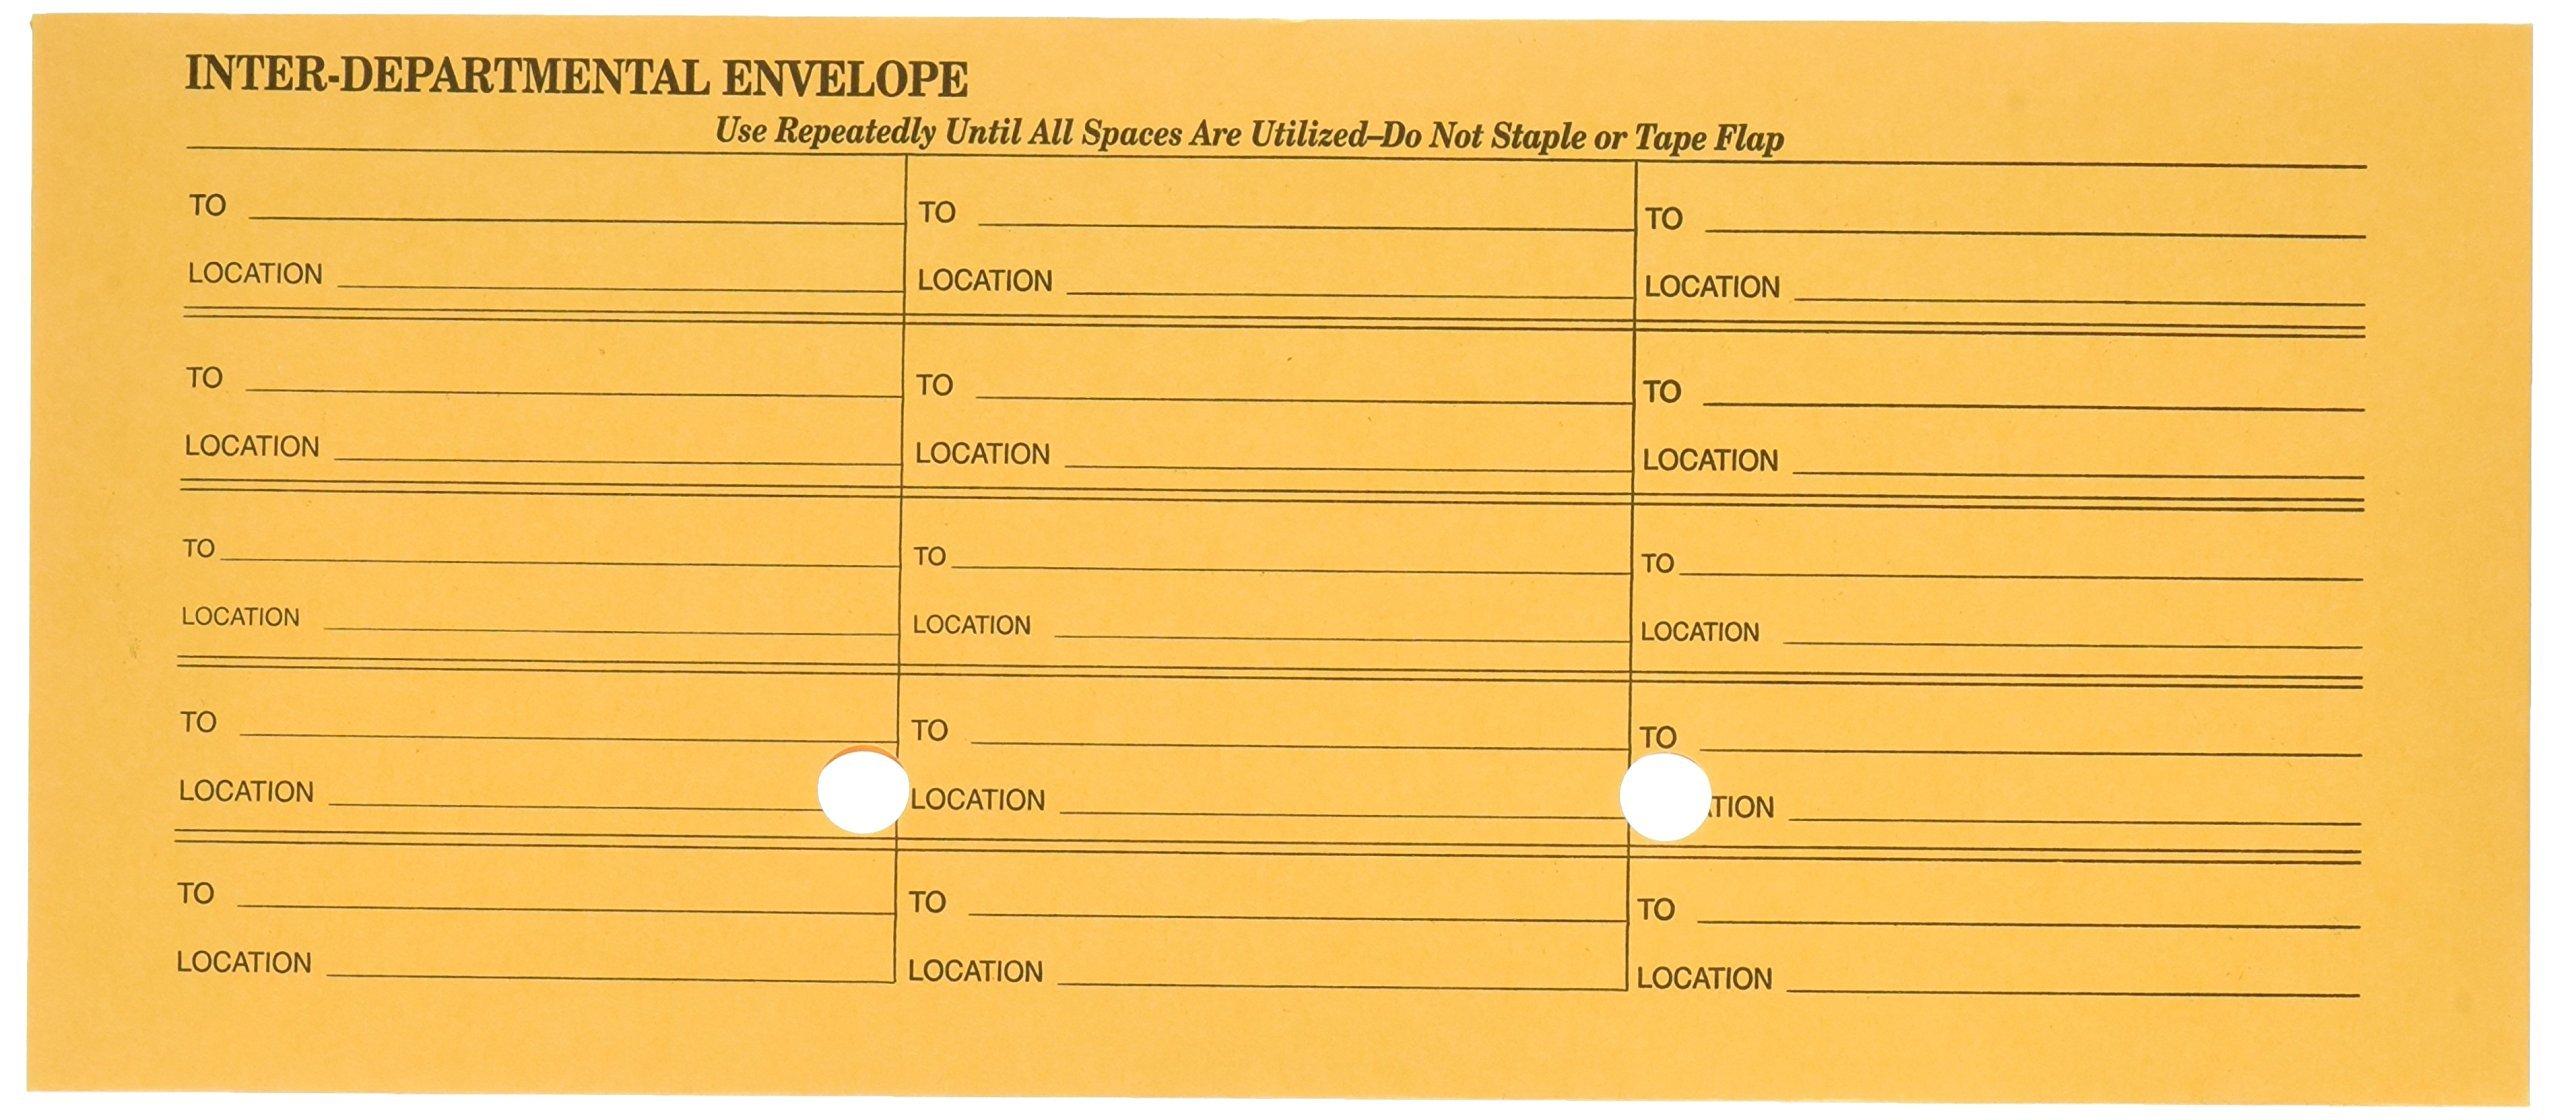 Quality Park Interoffice Envelopes, Ungummed, Brown Kraft, 4.5 x 10.375, 500 per Box, (63262) by Quality Park